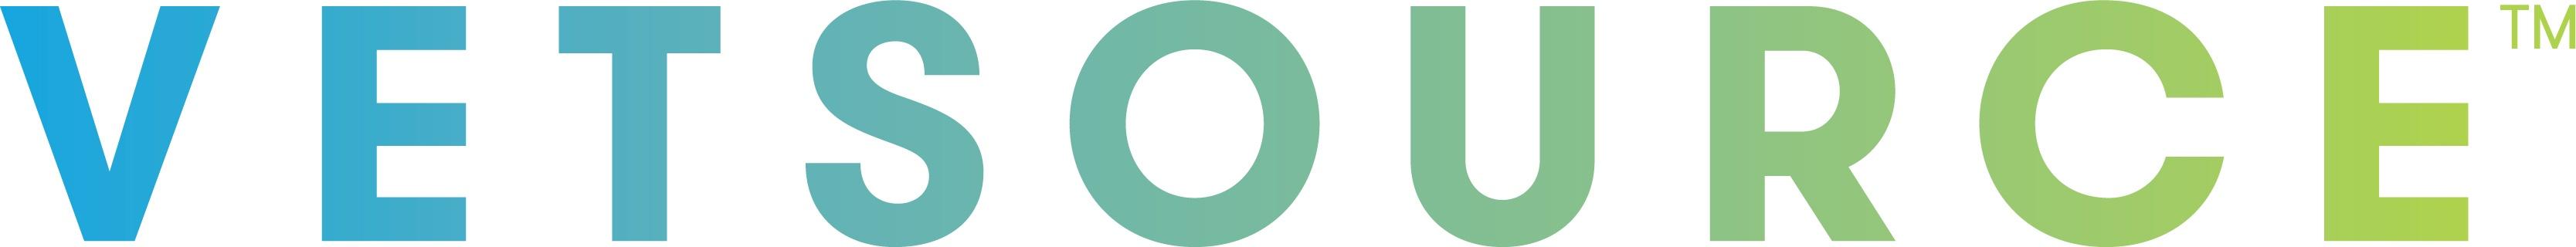 Logo_GradientTM